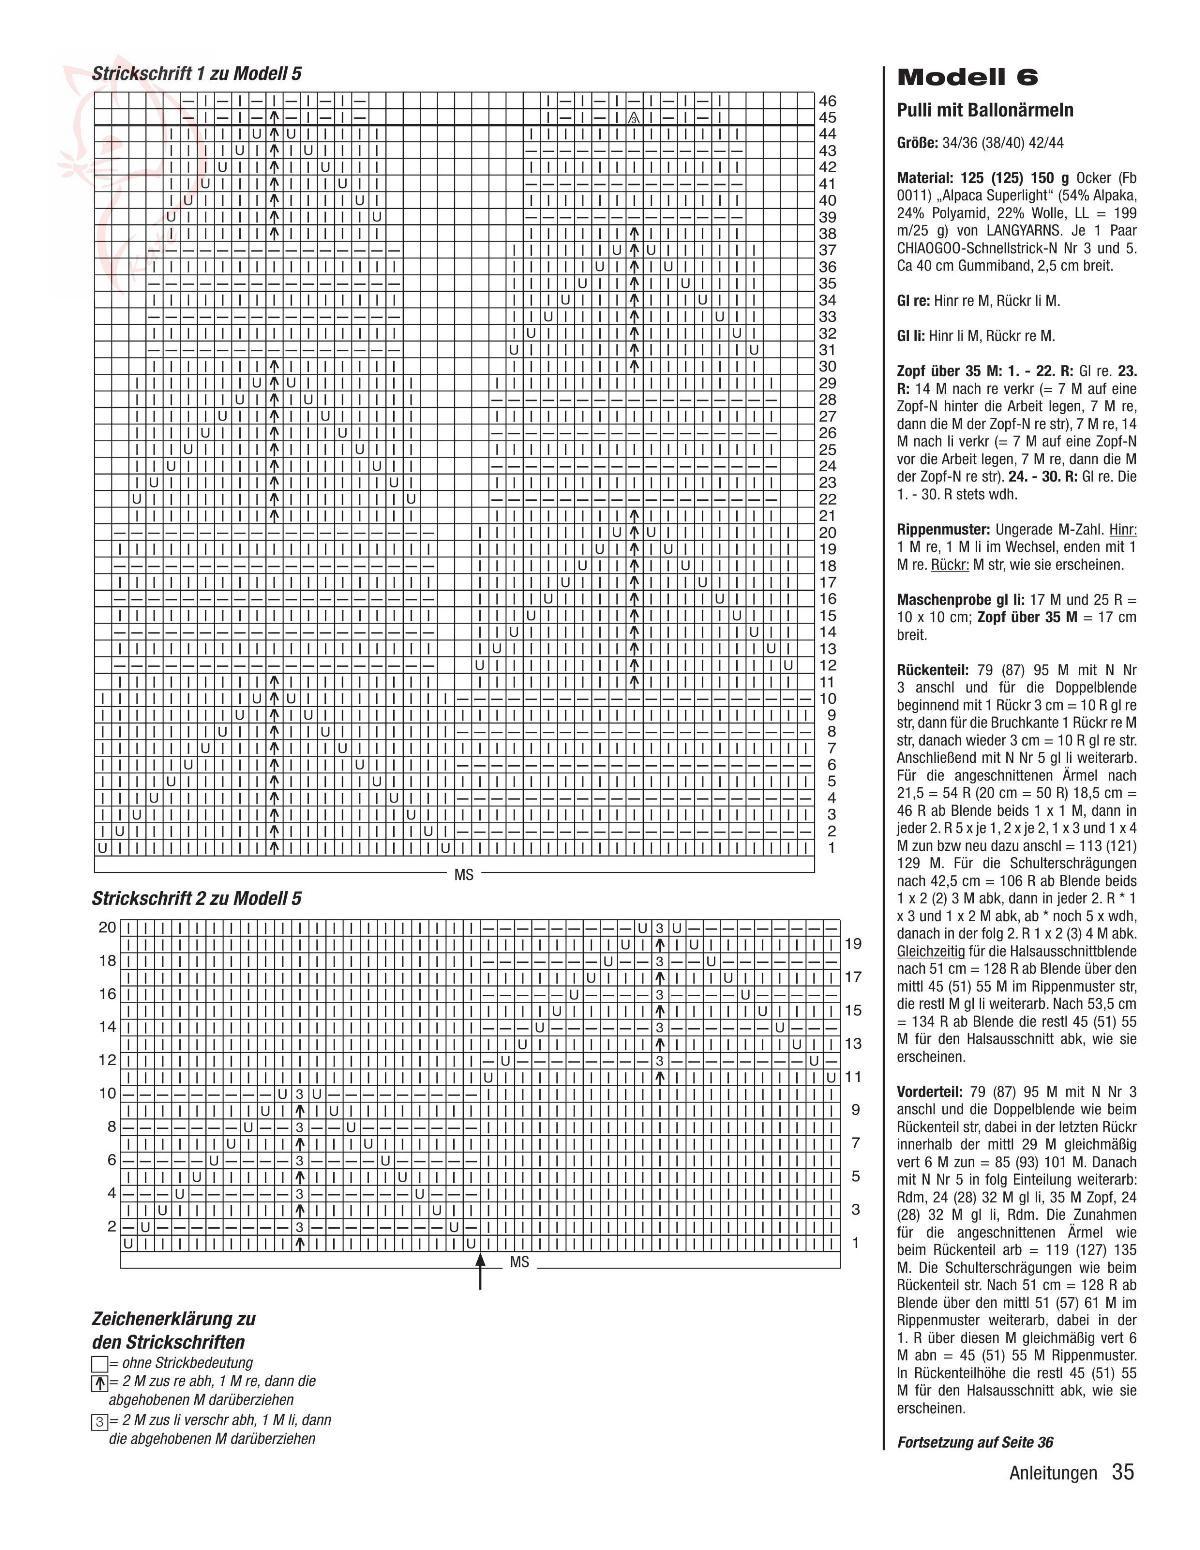 Page_00035.jpg